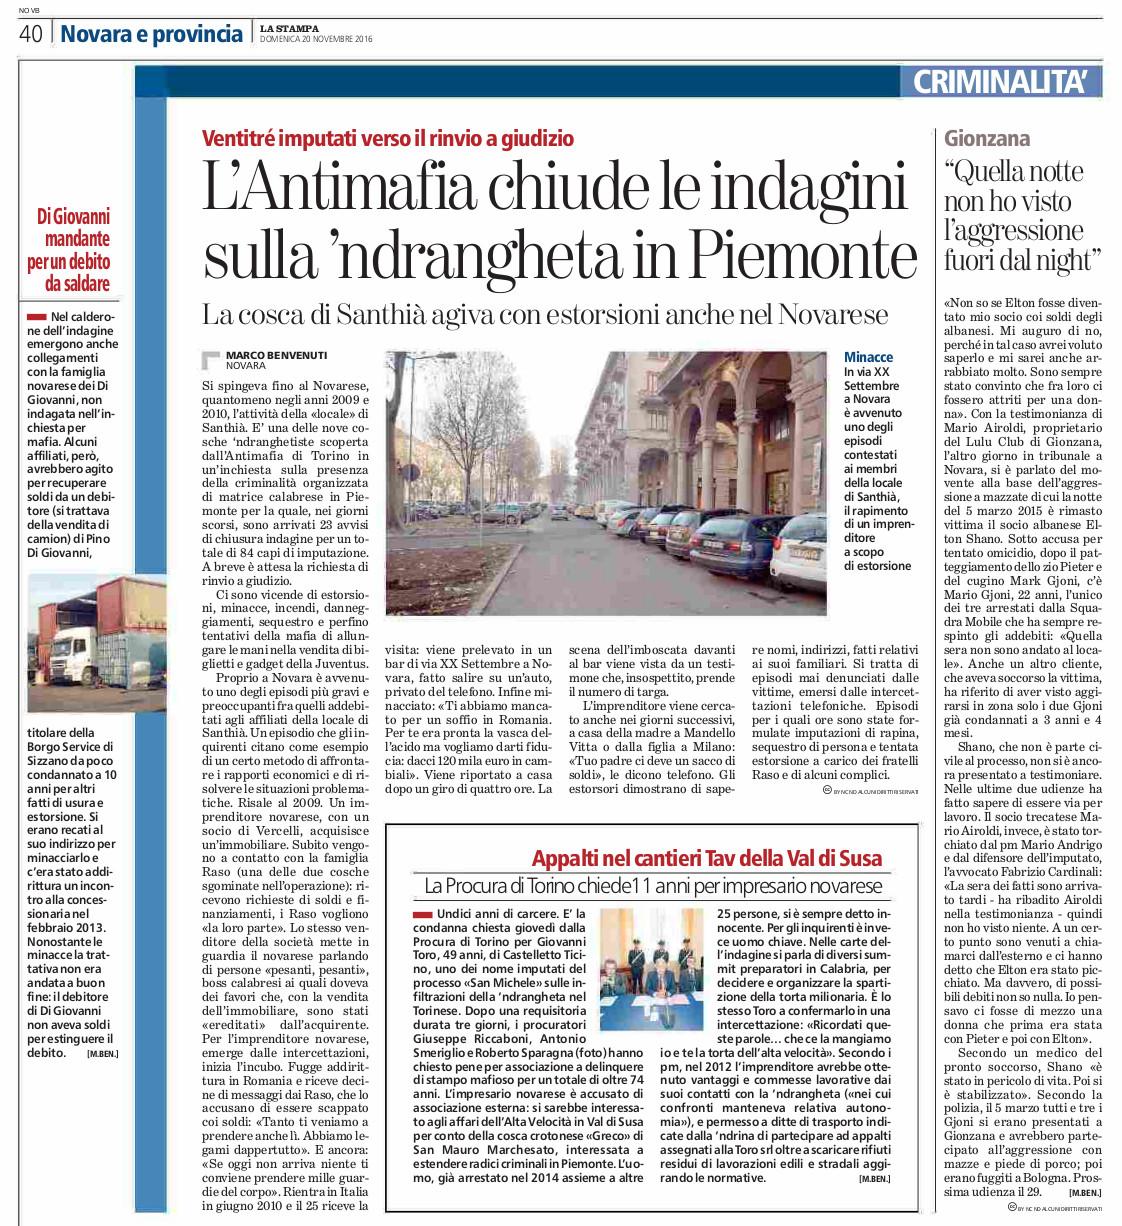 20-11-2016_ndrangheta_santhia_indaginichiuse-sanmichele_toro_accusa_lastampa-novara